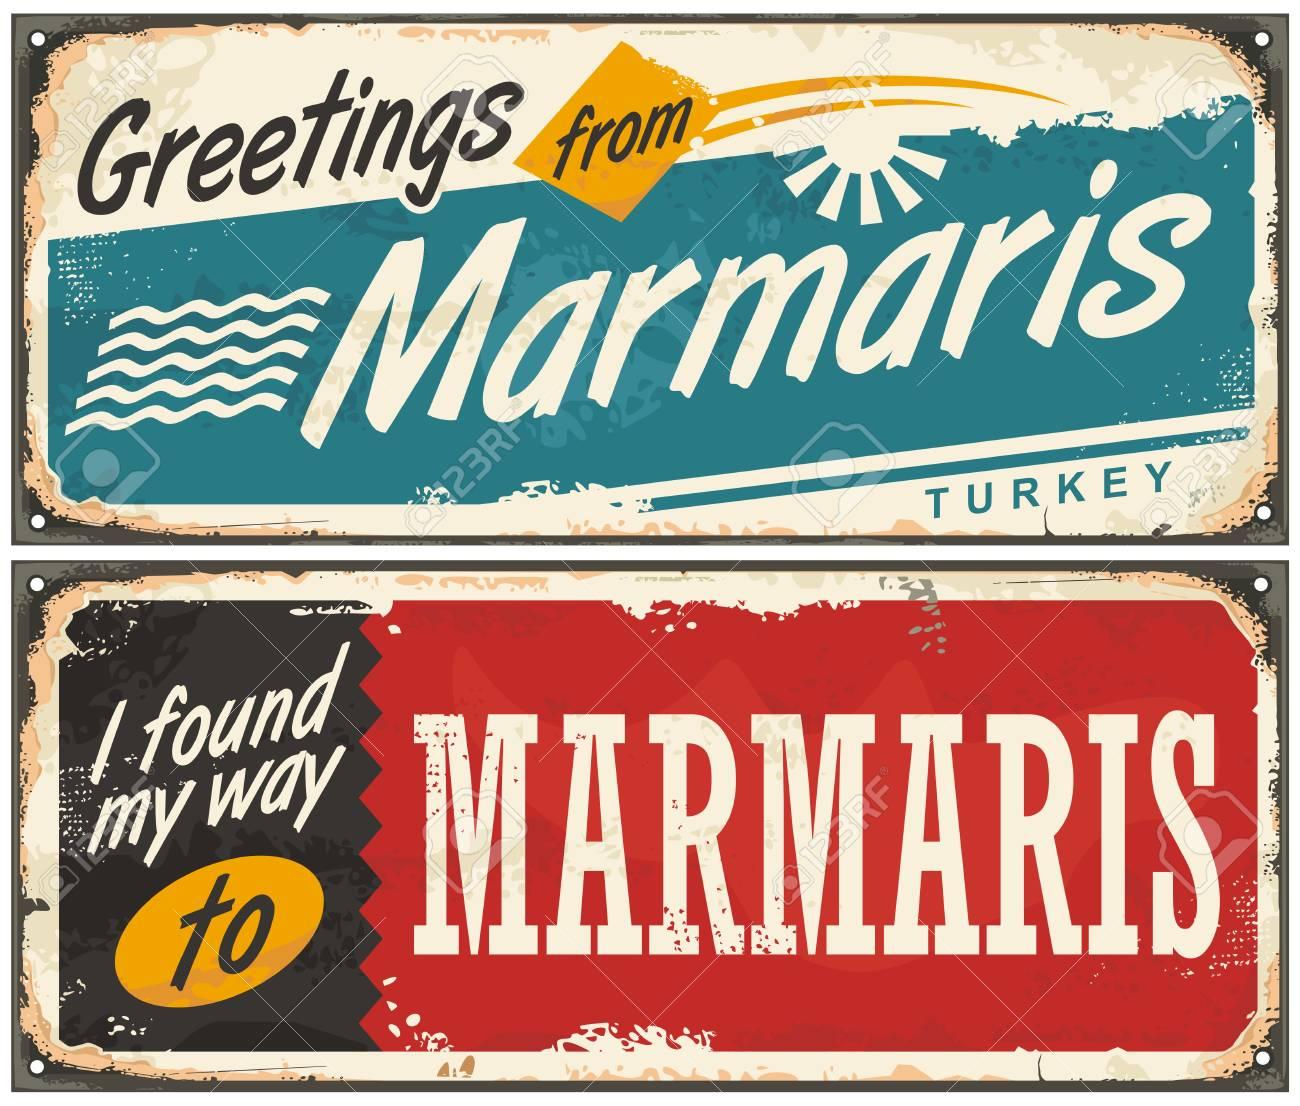 Greetings from marmaris turkey retro tin signs set royalty free greetings from marmaris turkey retro tin signs set stock vector 81514740 m4hsunfo